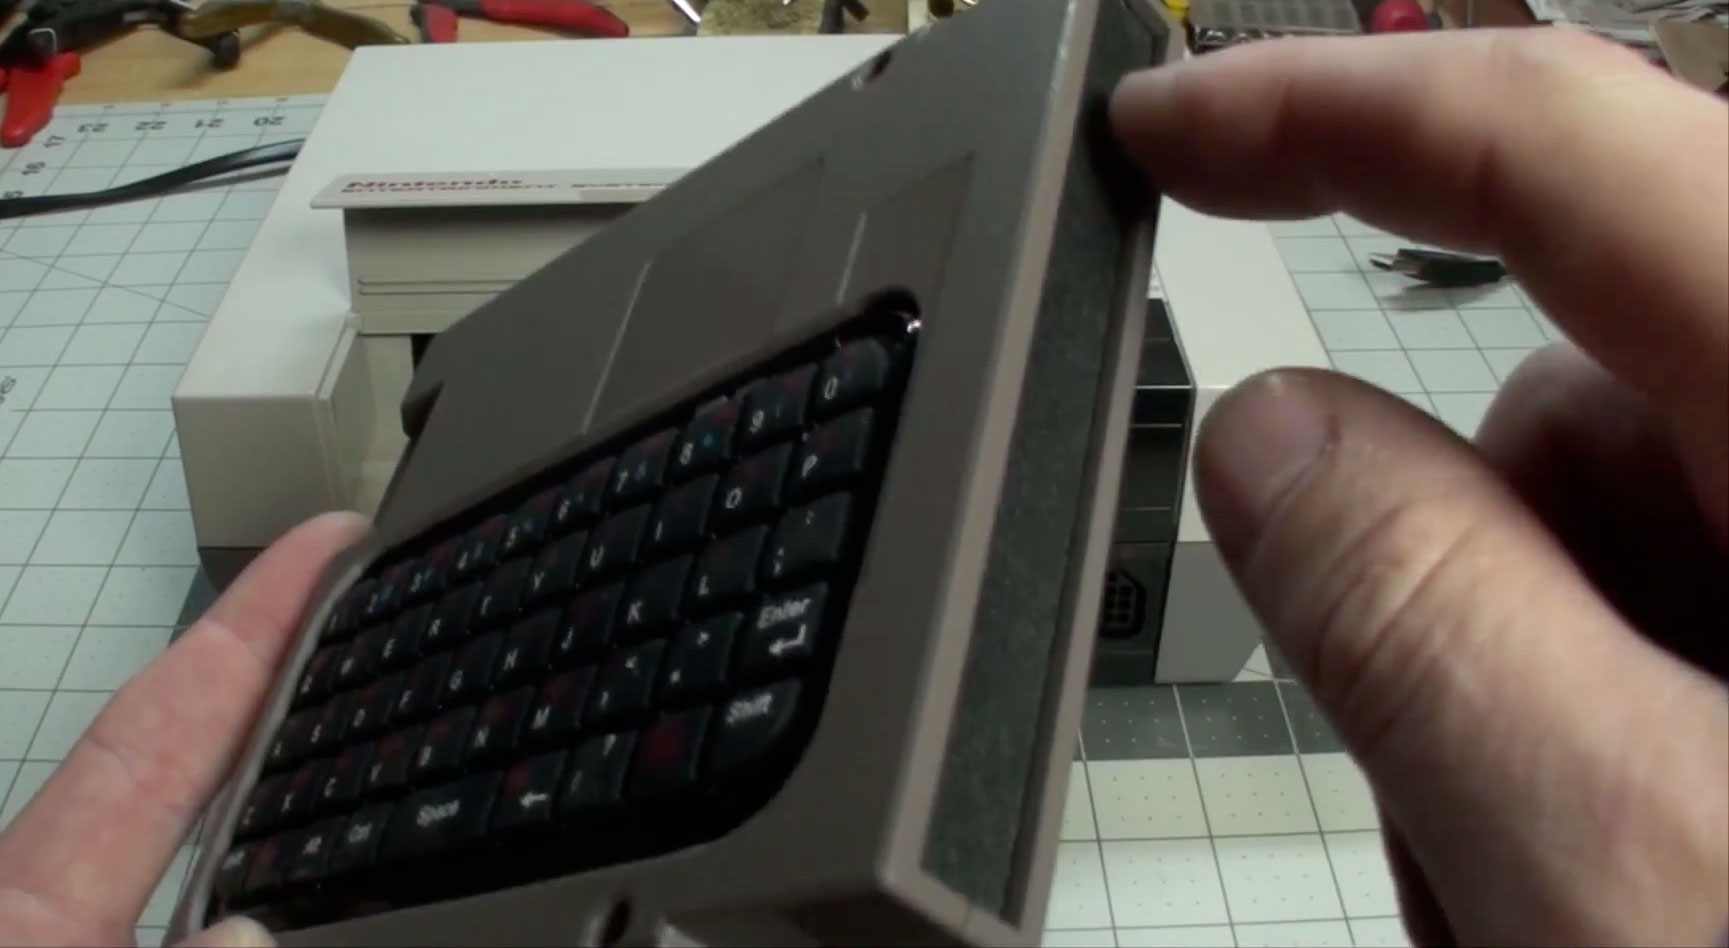 49ad6d6370a NES keyboard: hack a bluetooth keyboard cartridge. Innovative Raspberry Pi  ...